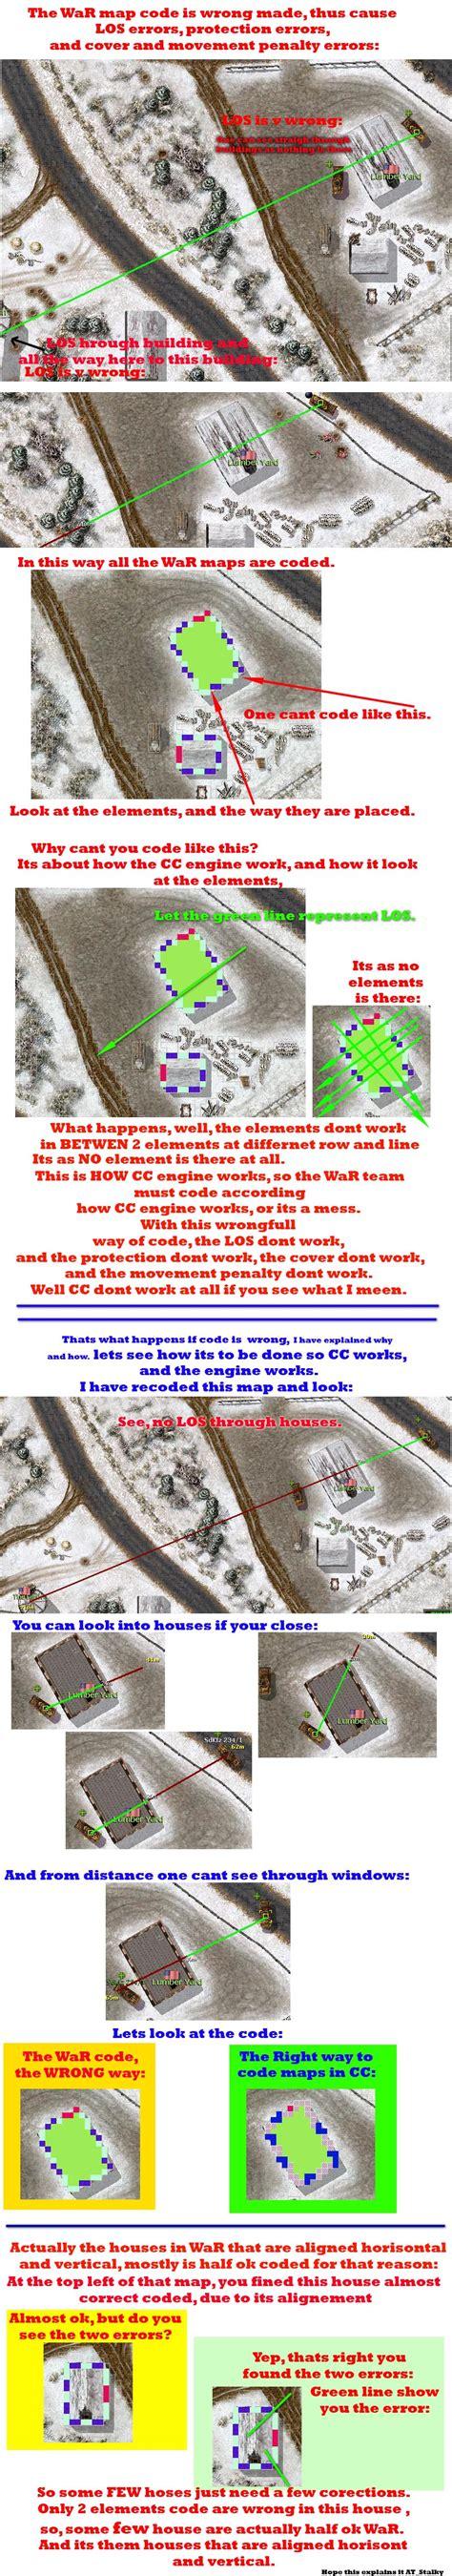 patternexplorer 4 50 crack close combat wacht am rhein with crack 4 50 2 patch iso